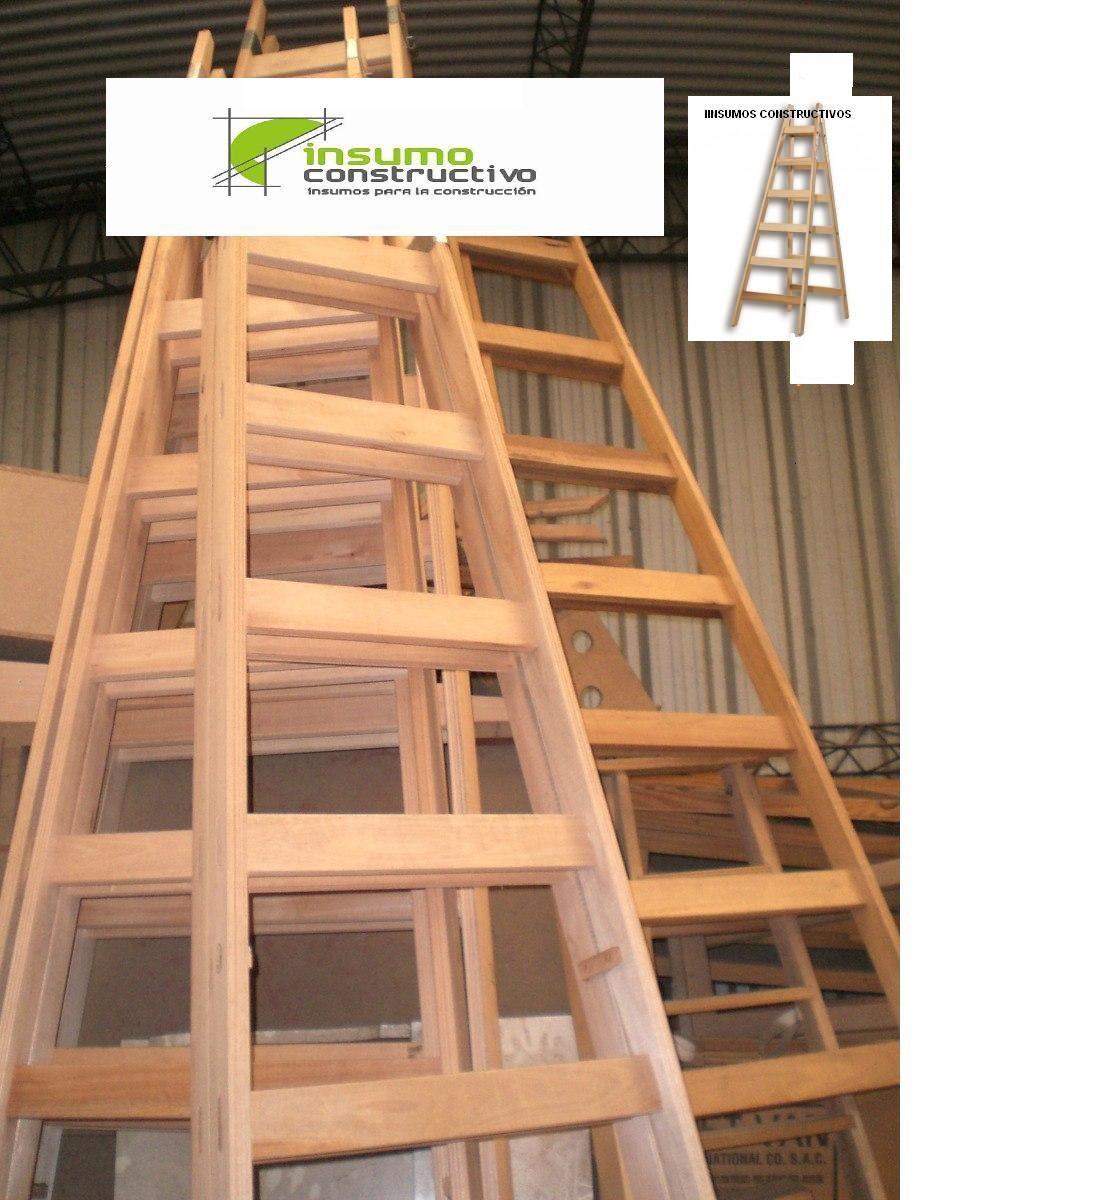 Escalera pintor en madera 7 escalones reforzada for Escaleras 7 escalones